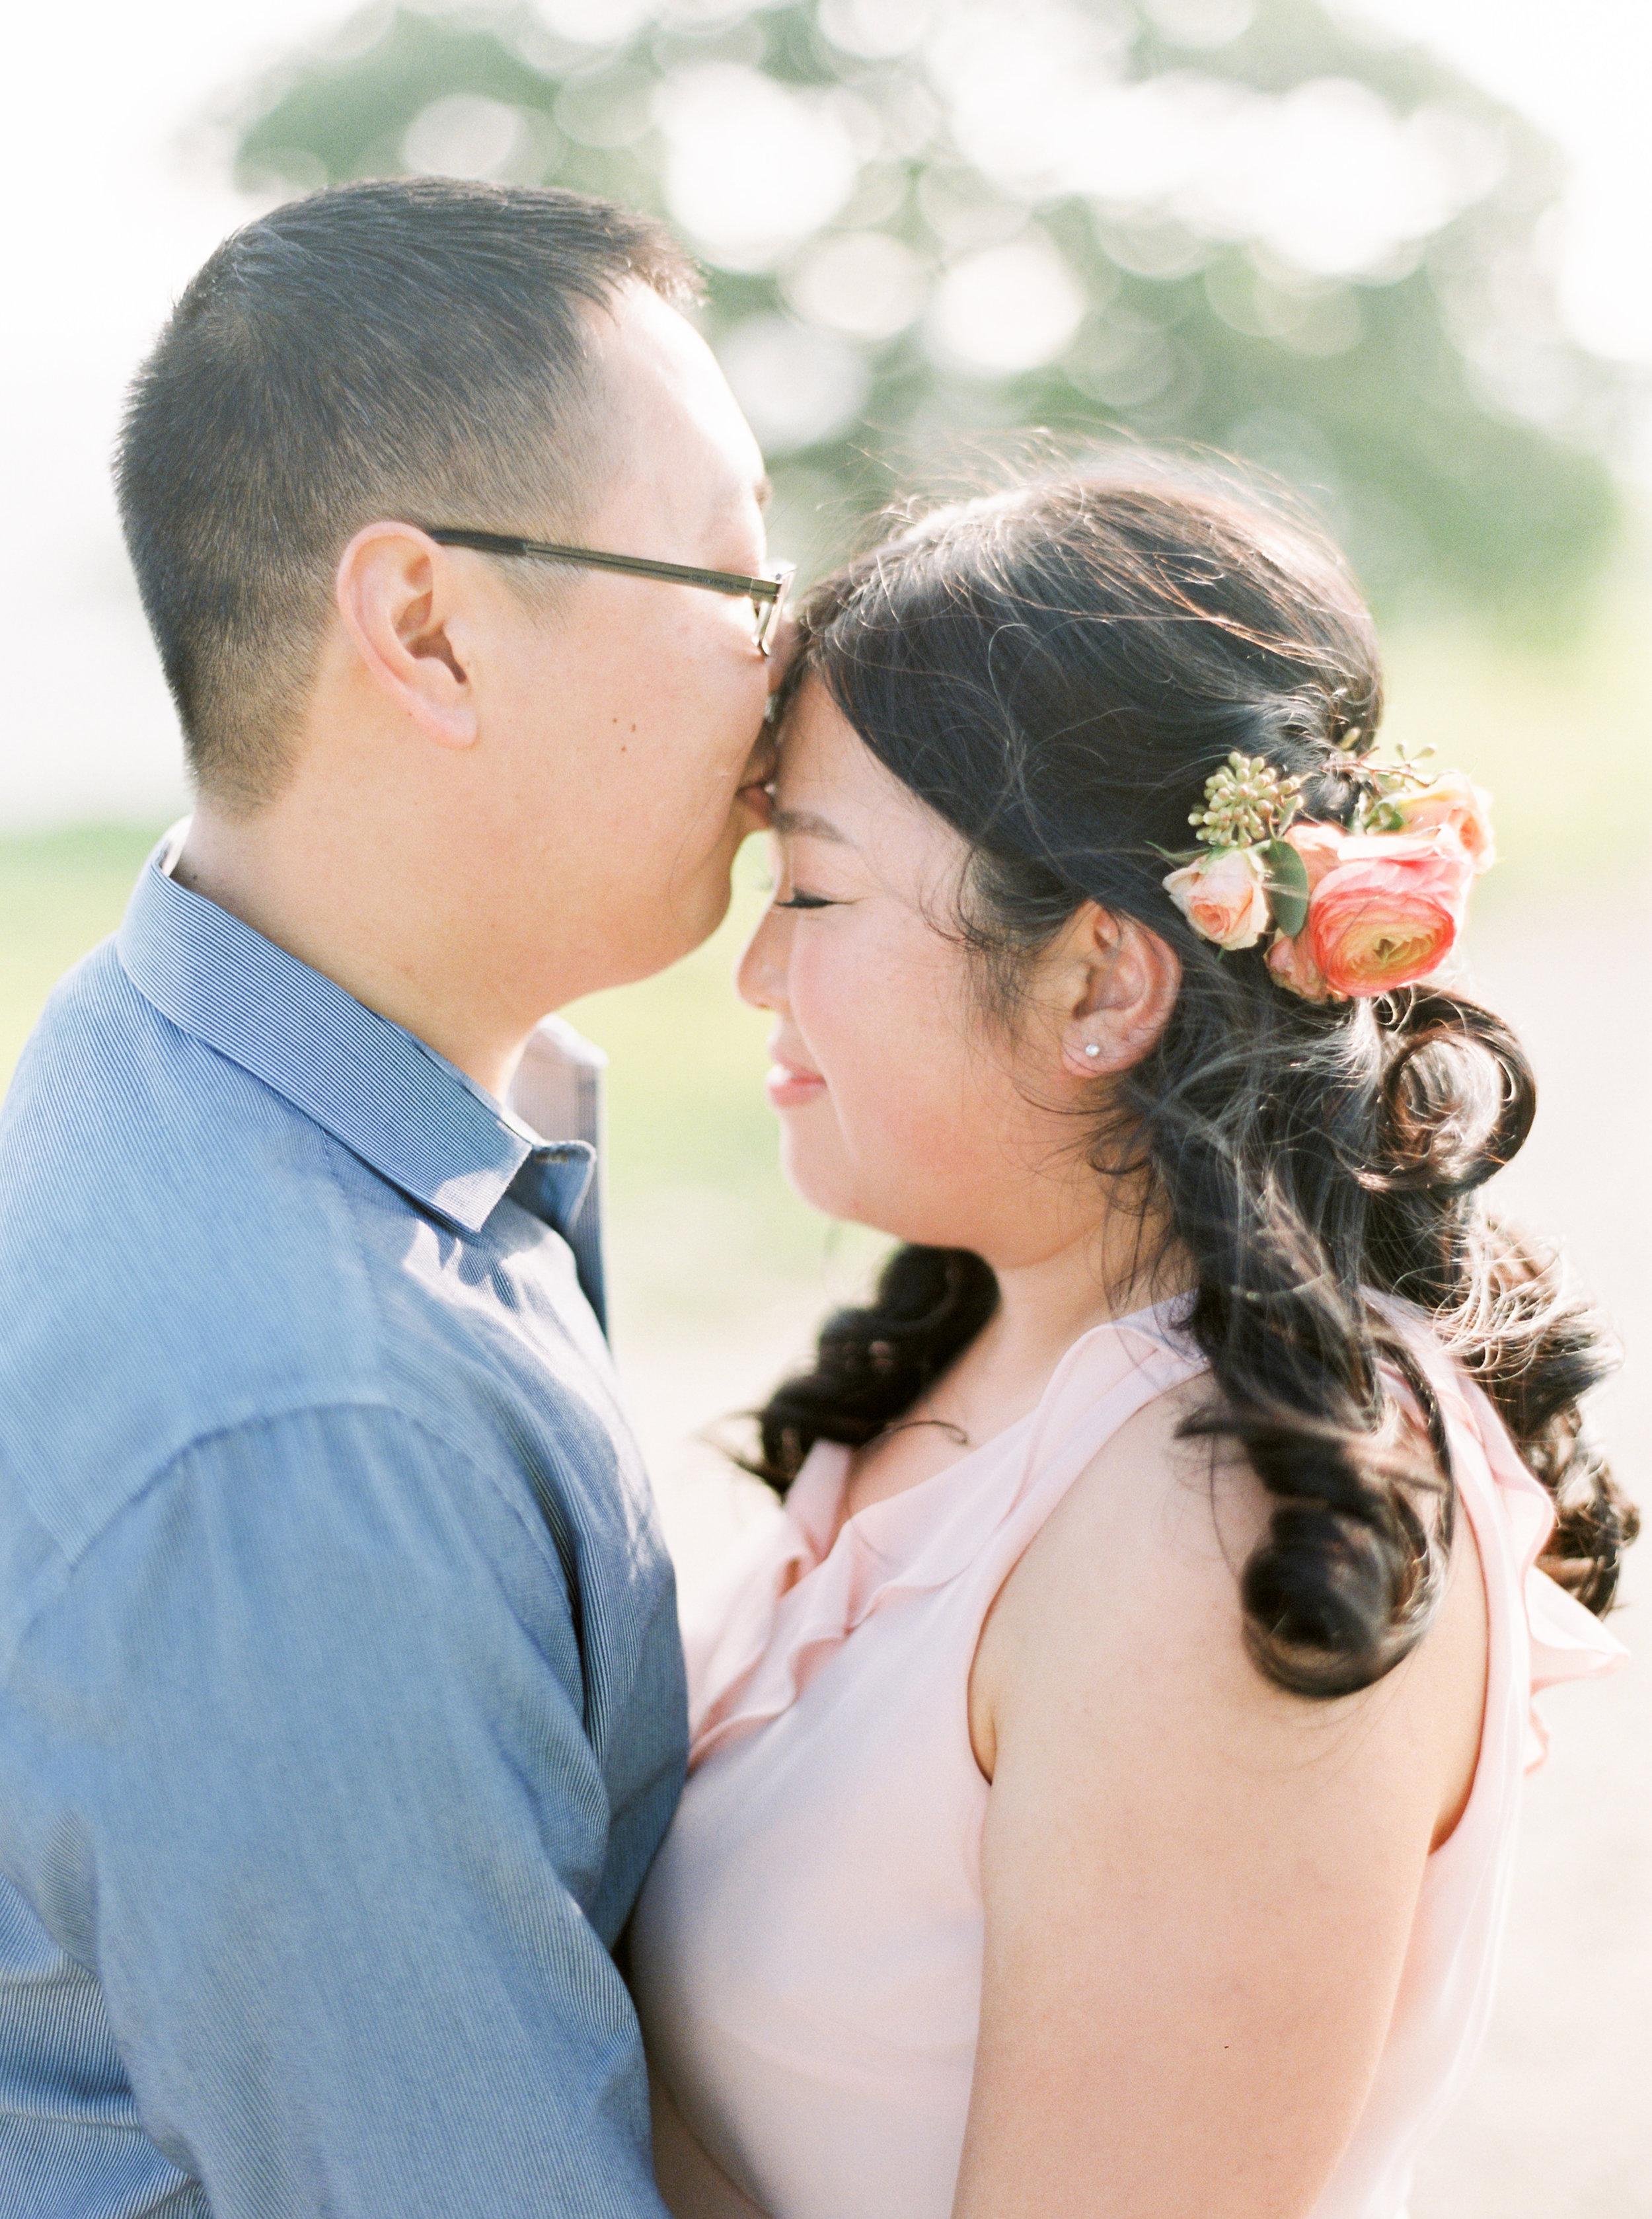 del-valle-livermore-bay-area-wedding-photographer-80.jpg